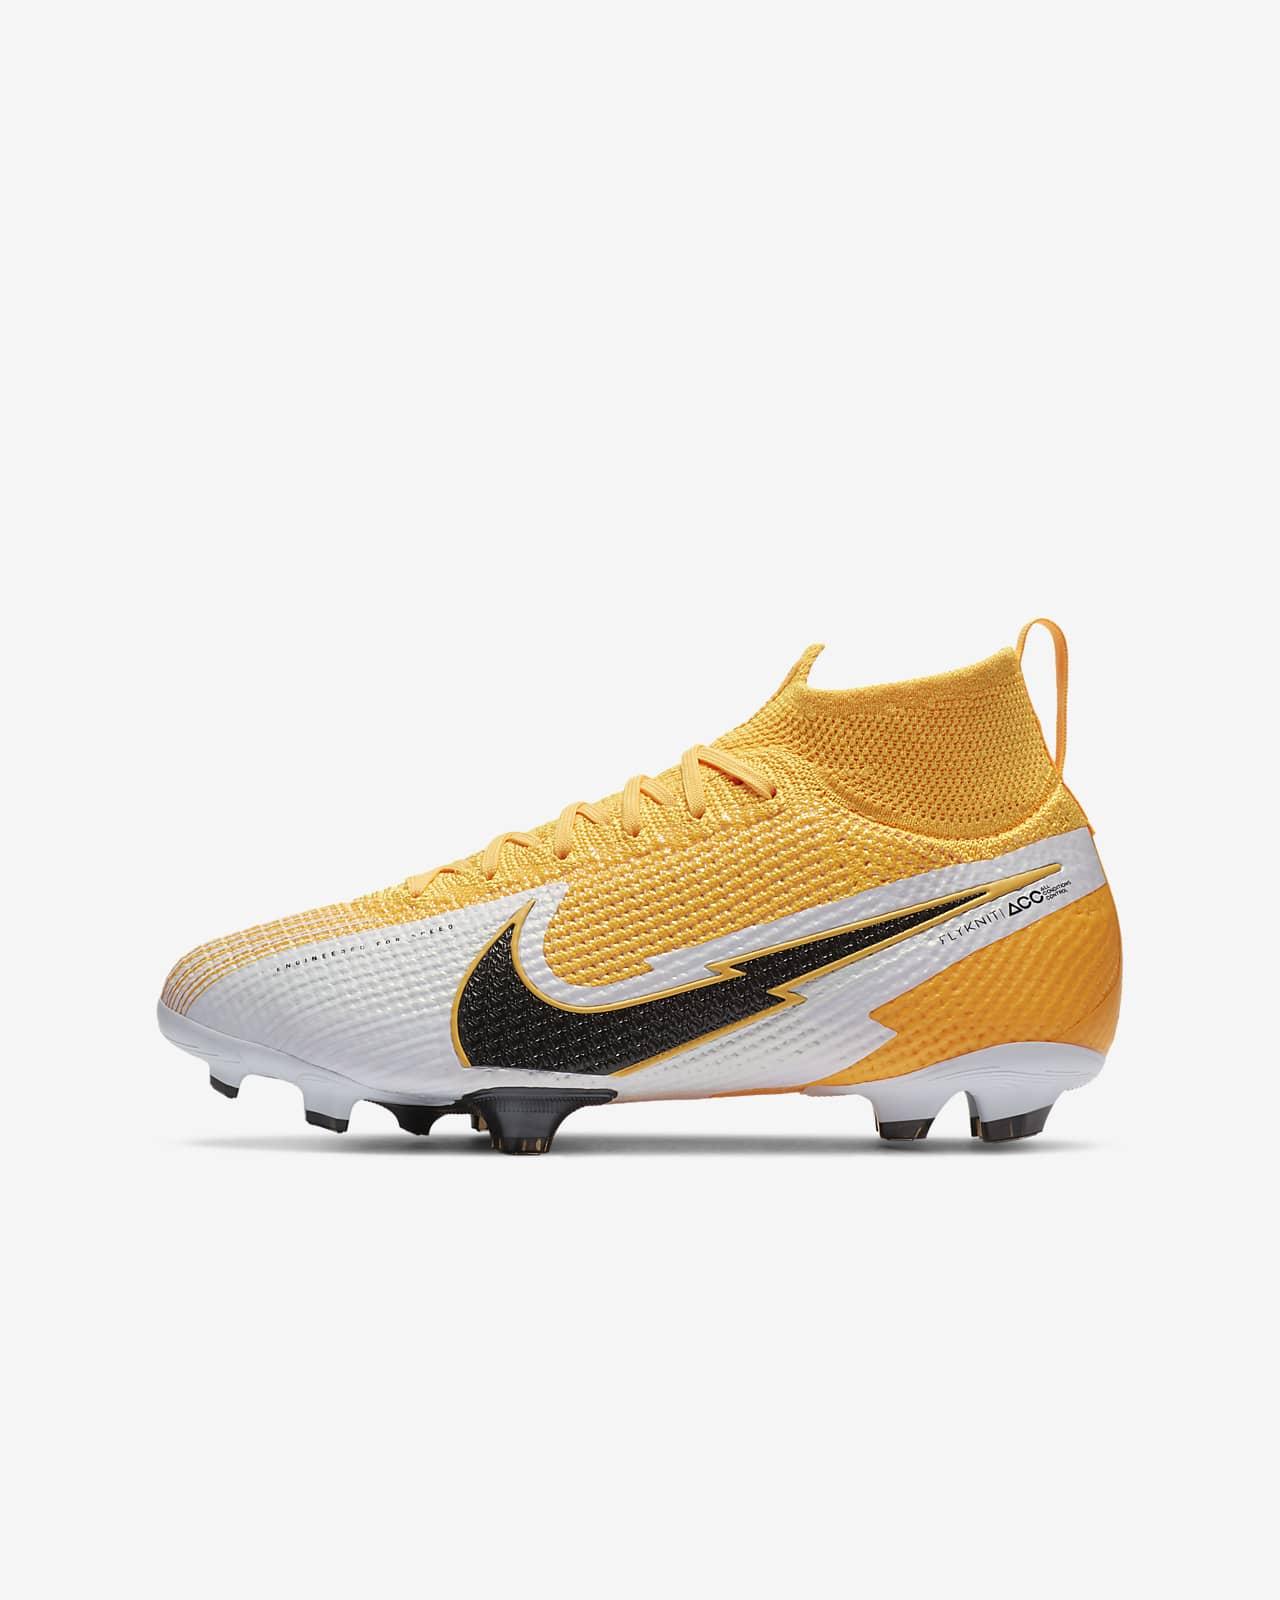 Nike Jr. Mercurial Superfly 7 Elite FG Botas de fútbol para terreno firme - Niño/a